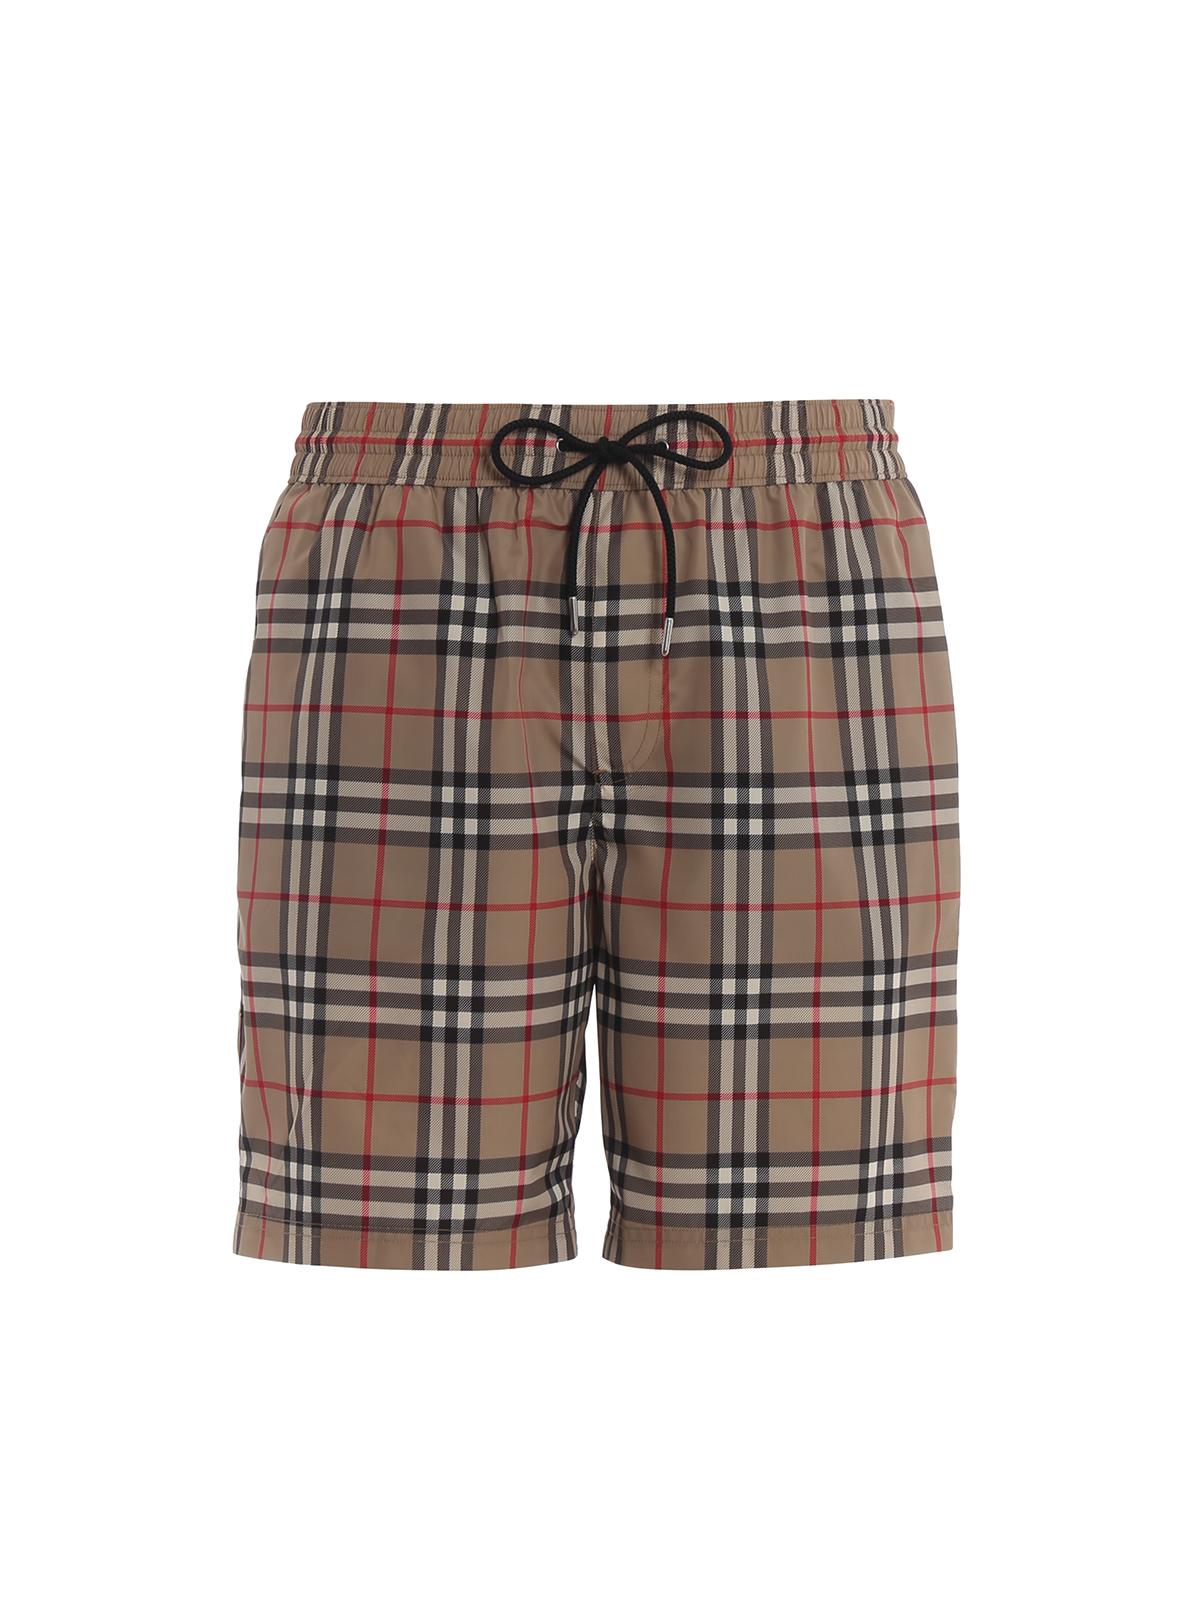 76bbbb305c BURBERRY: Swim shorts & swimming trunks - Guildes archive Check swim shorts